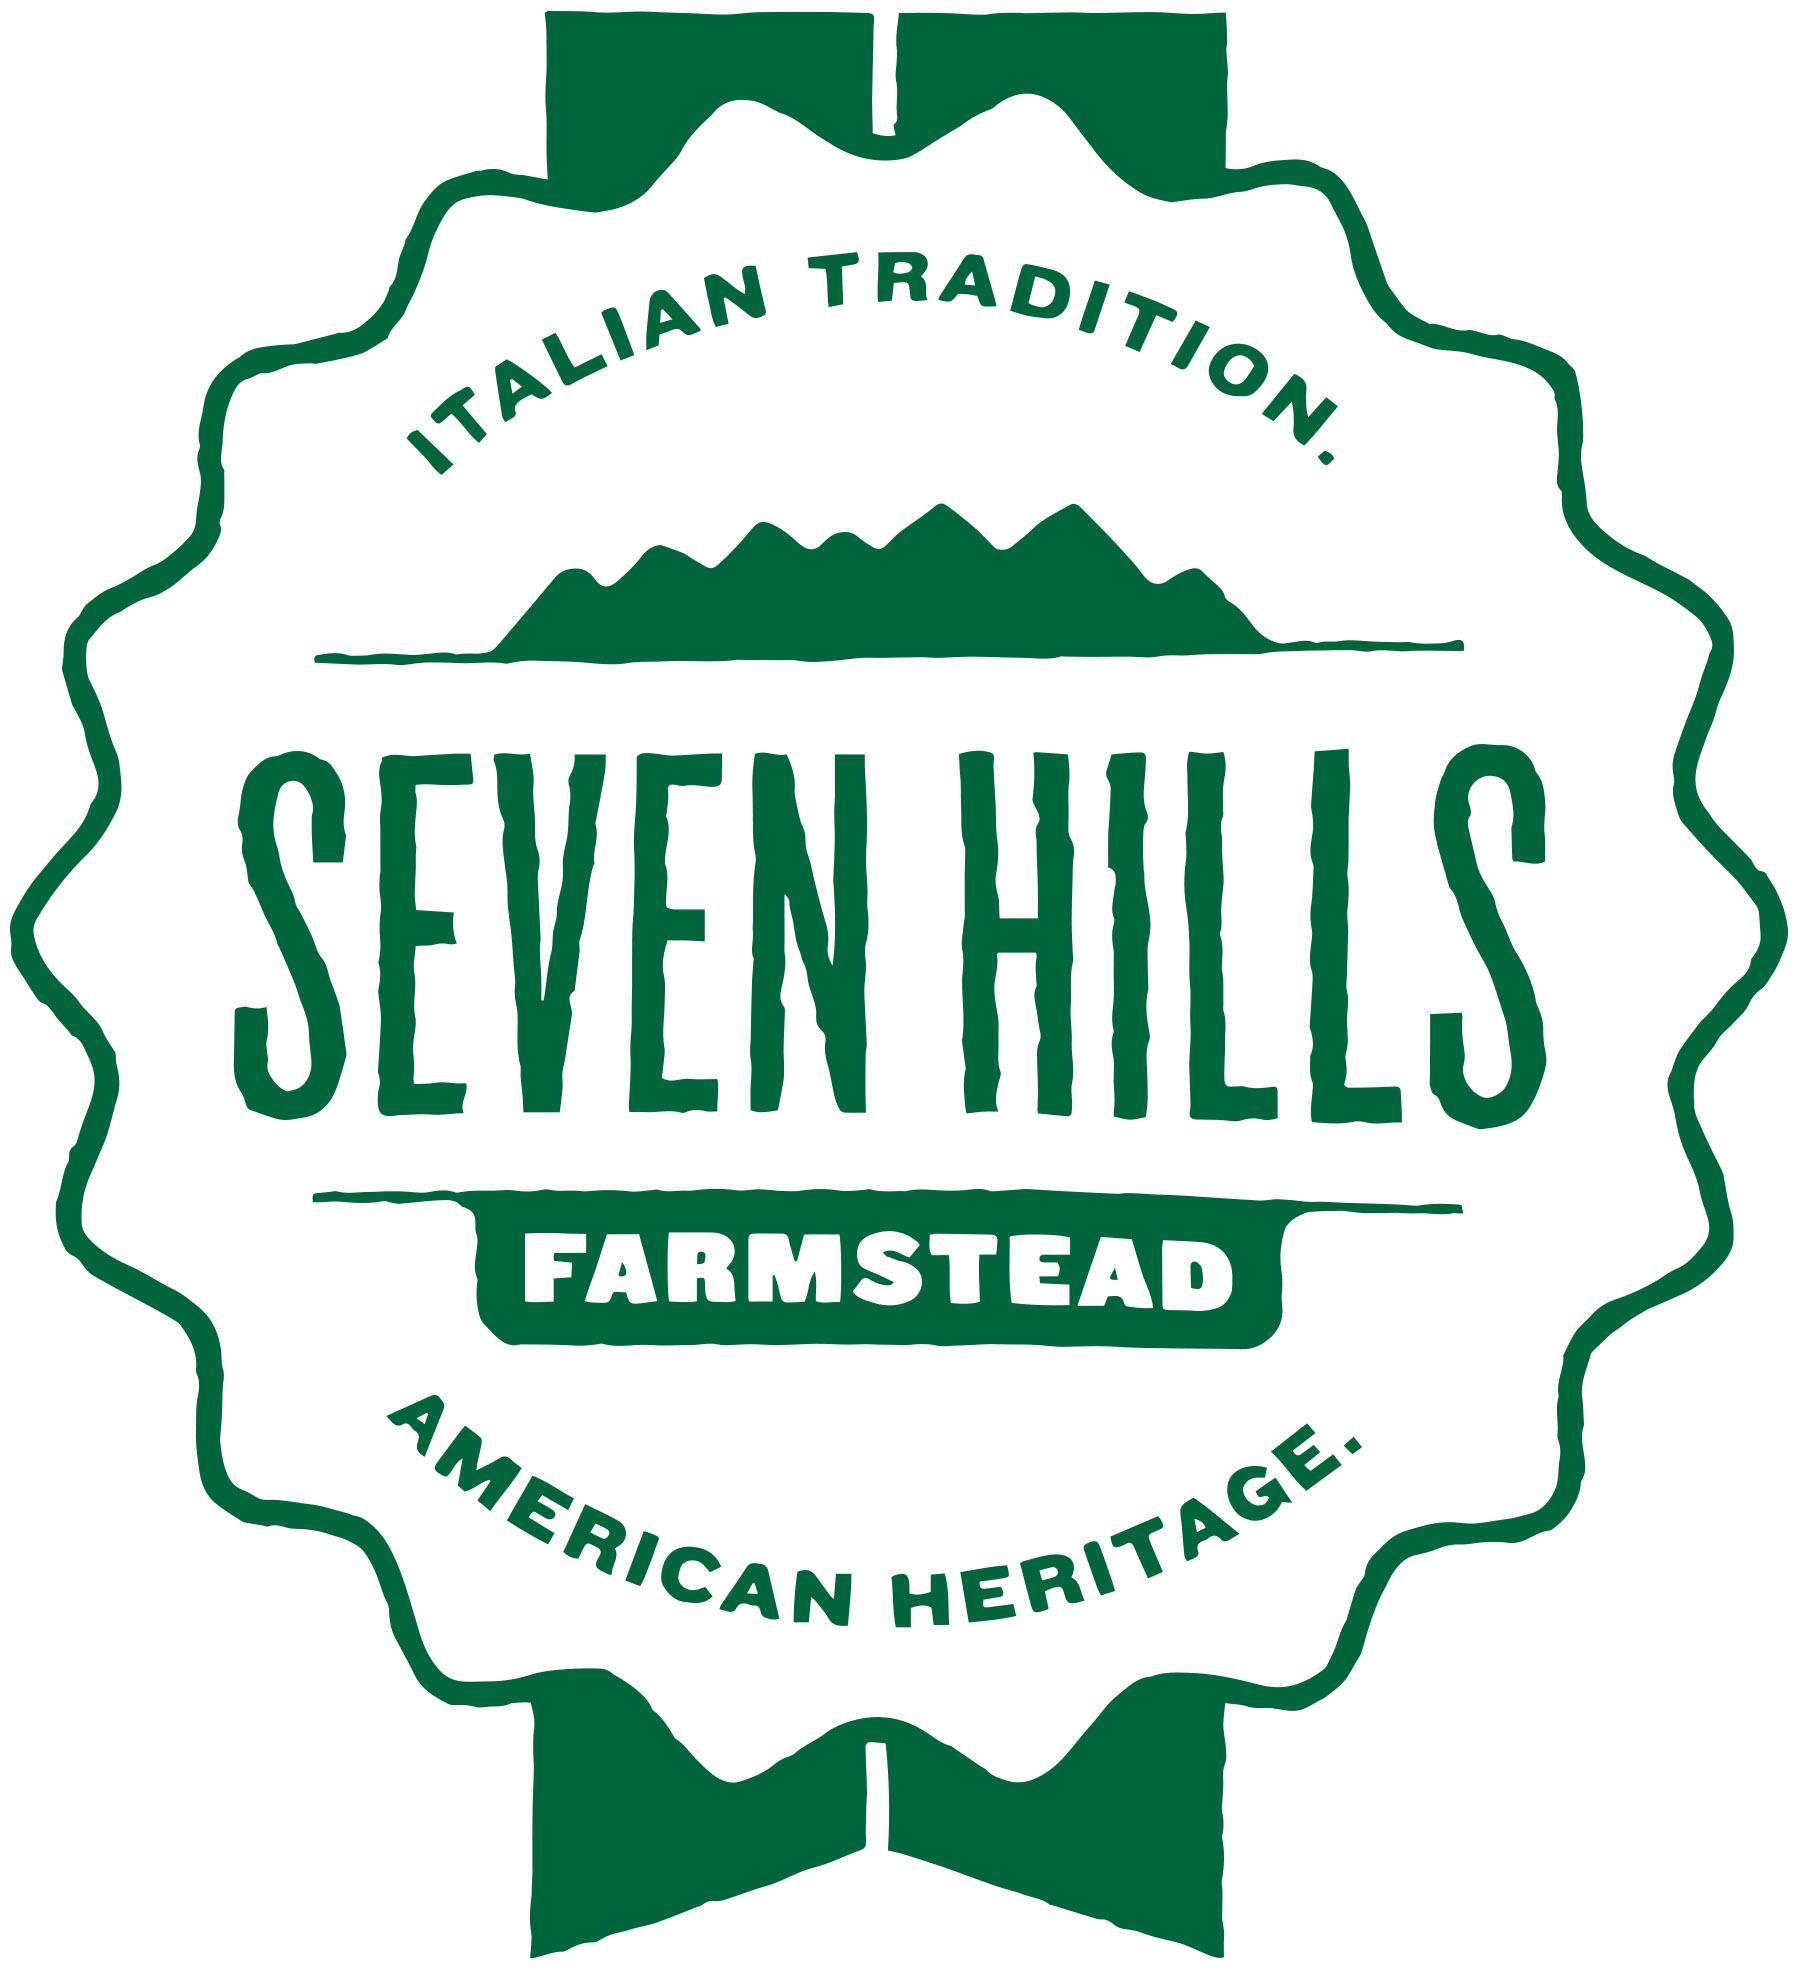 Seven Hills Farmstead